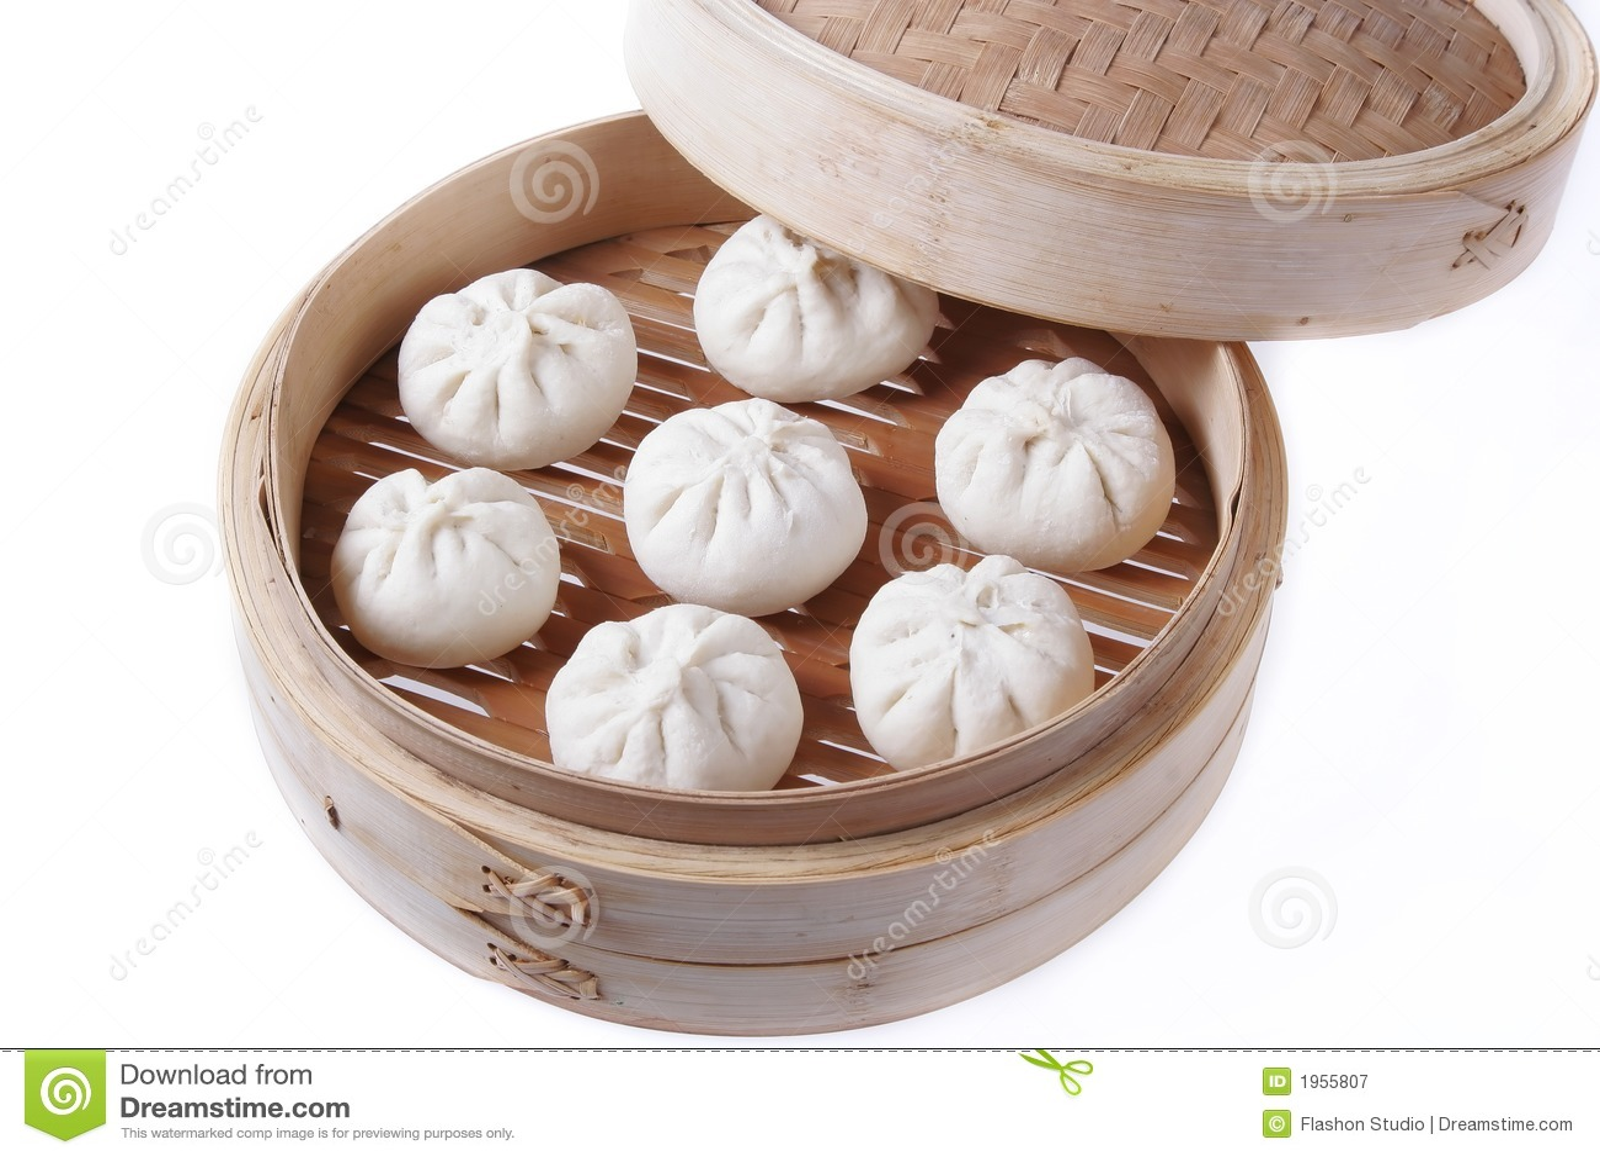 Dumplings In Bamboo Steamer Stock Image - Image of steam ...